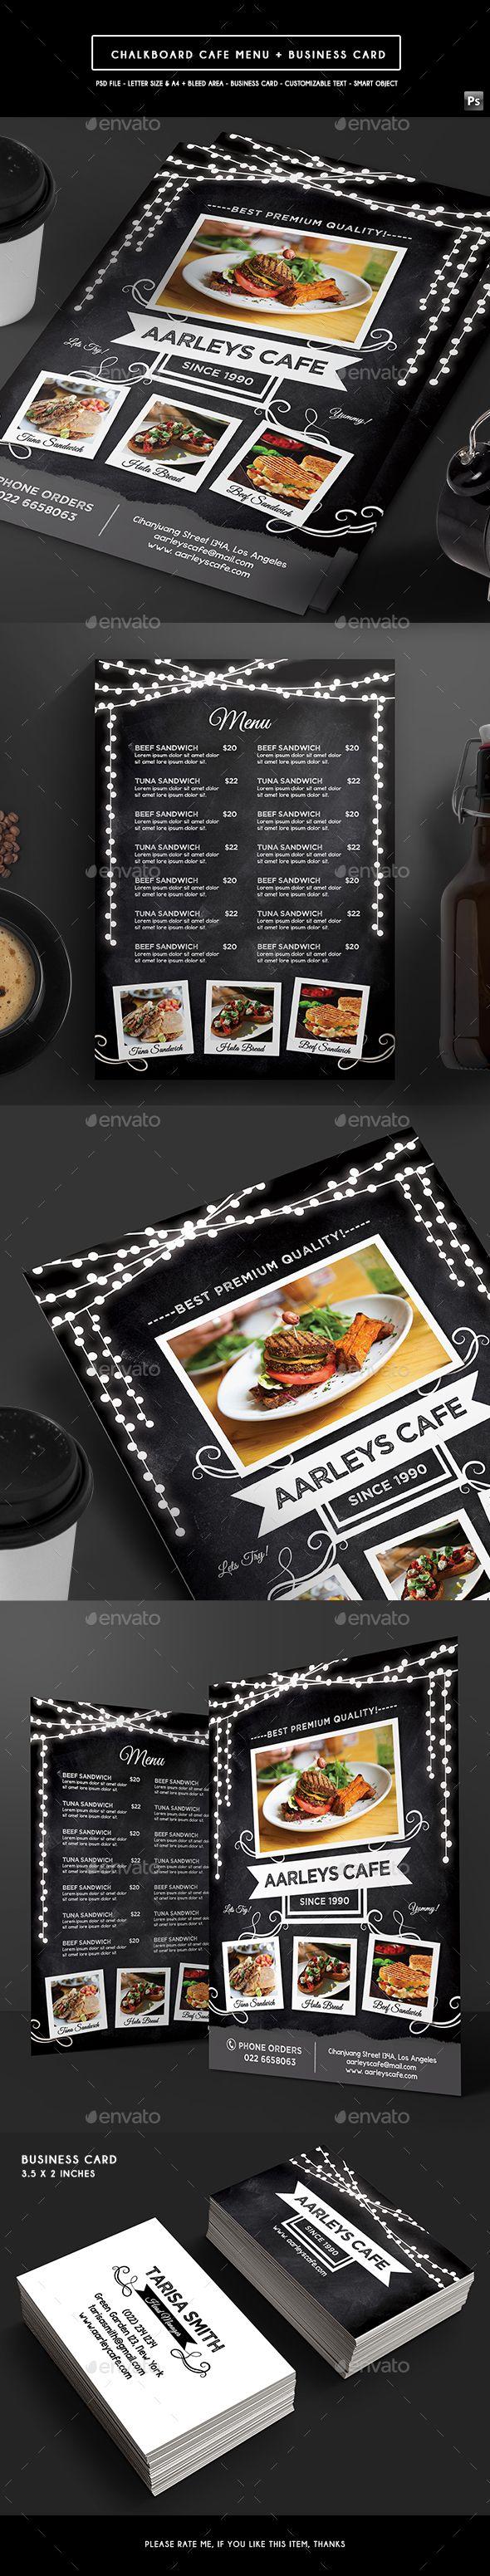 Blackboard Cafe Menu Flyer Design Template - Food Menus Print Template PSD. Download here: https://graphicriver.net/item/blackboard-cafe-menu-flyer/17404876?ref=yinkira